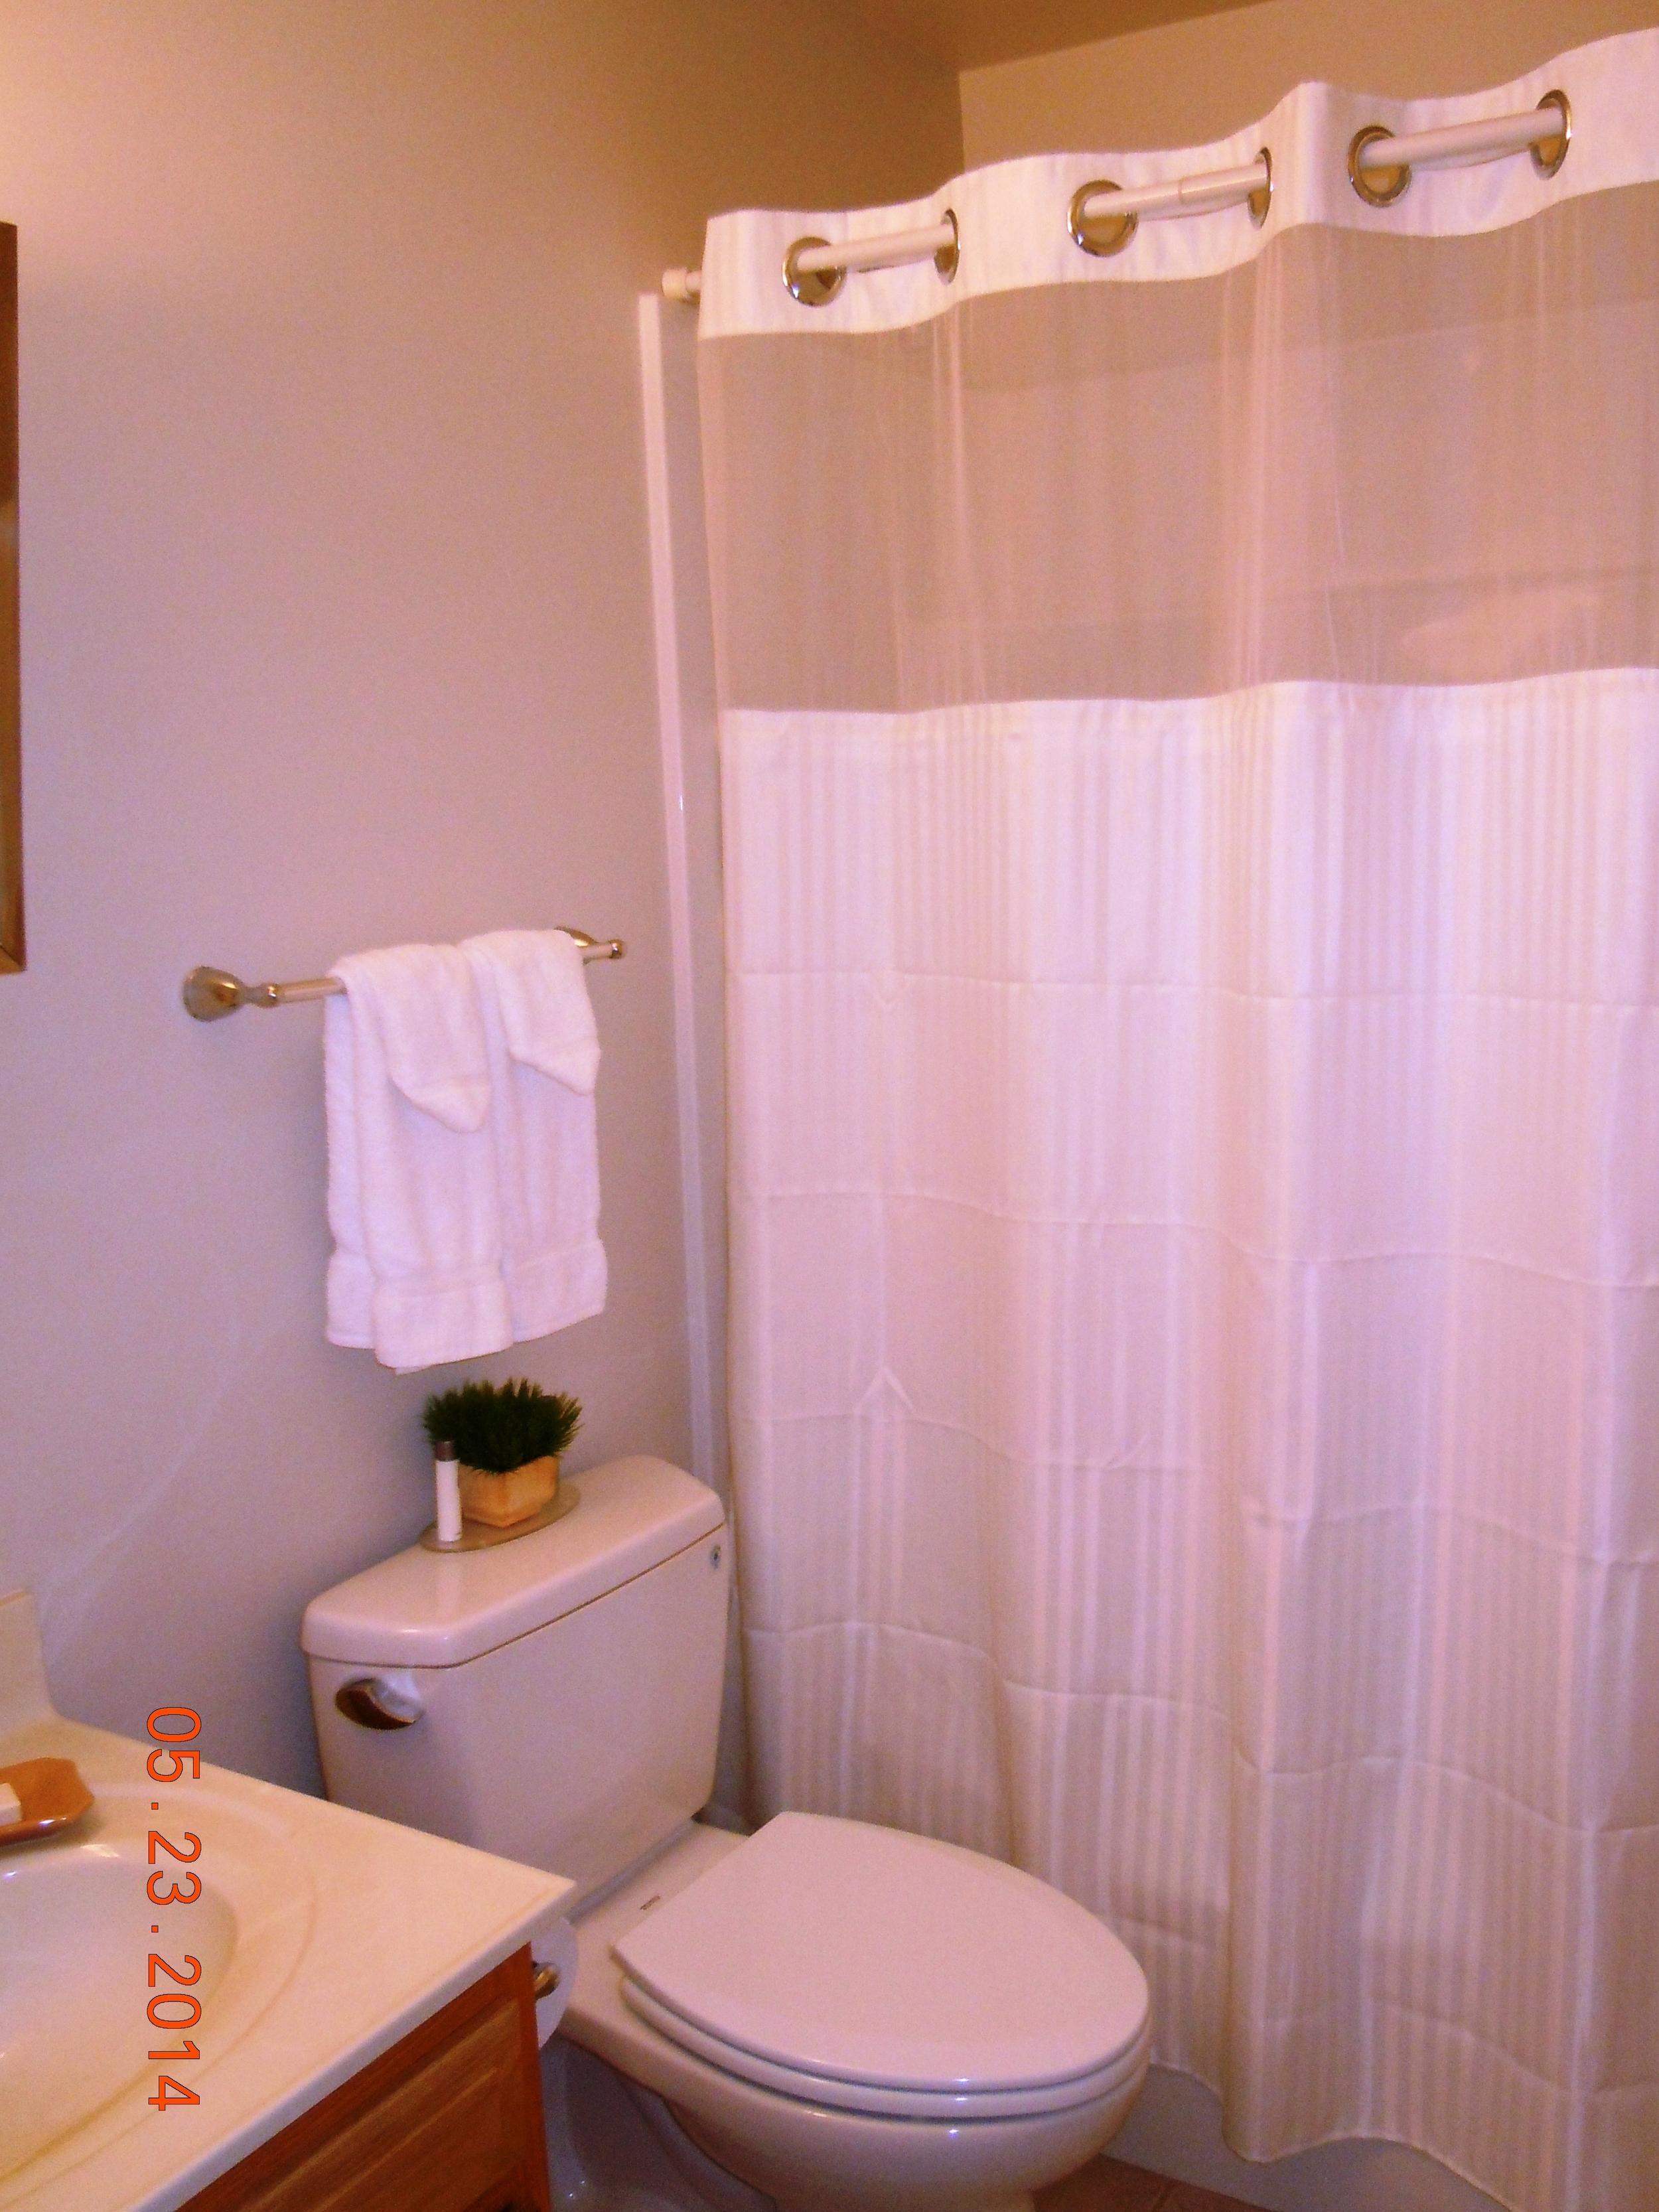 Apartment Guide Pictures (Dodi) 002.jpg